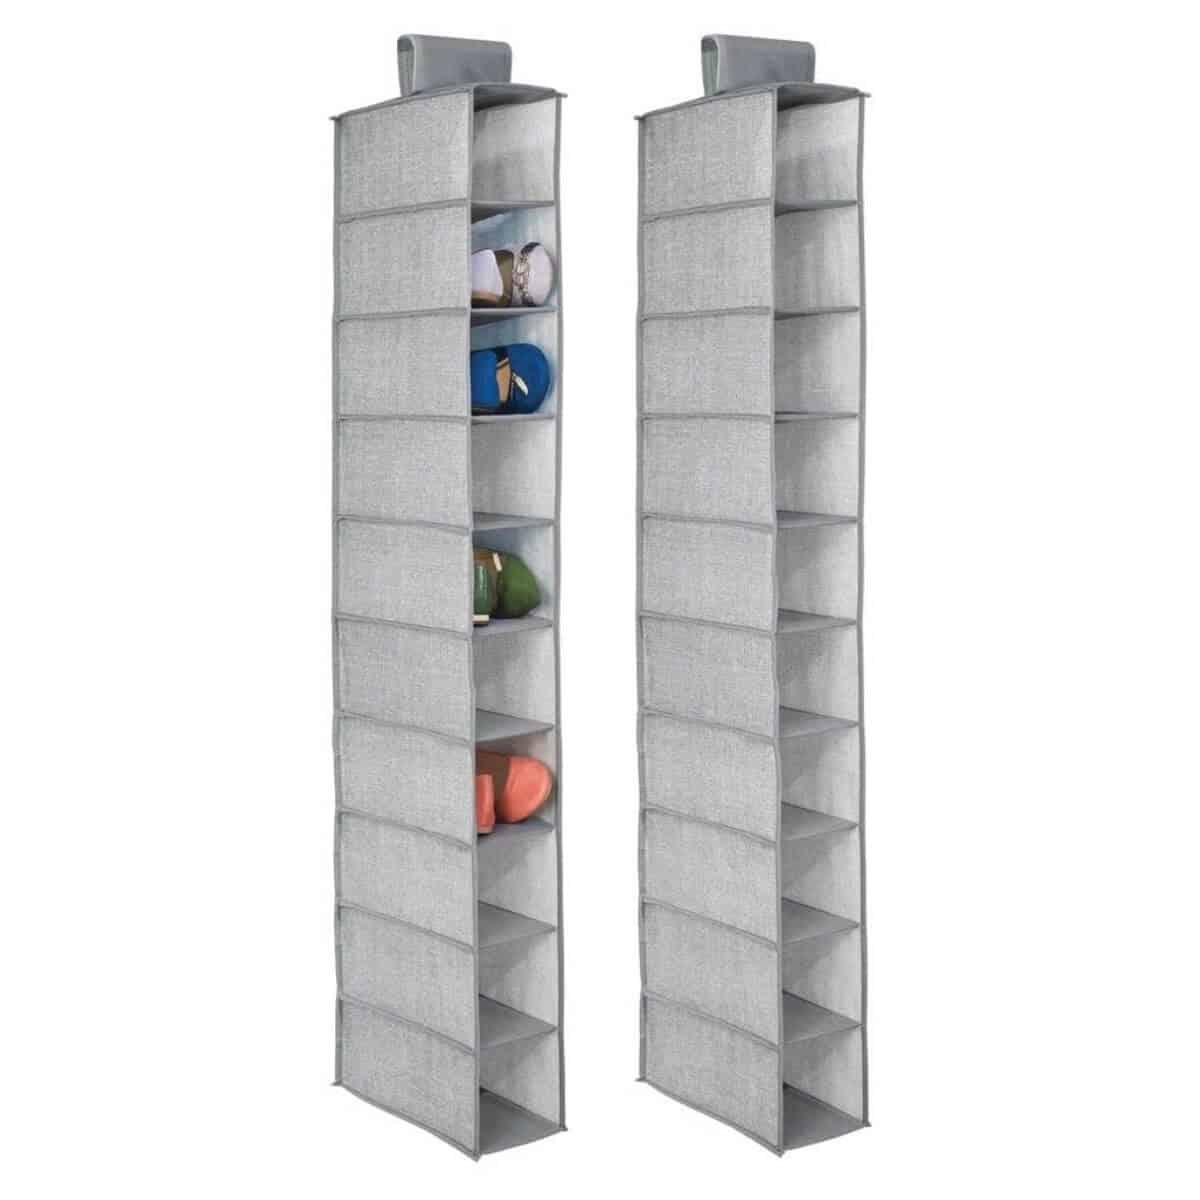 Two grey fabric vertical shoe storage organizers.